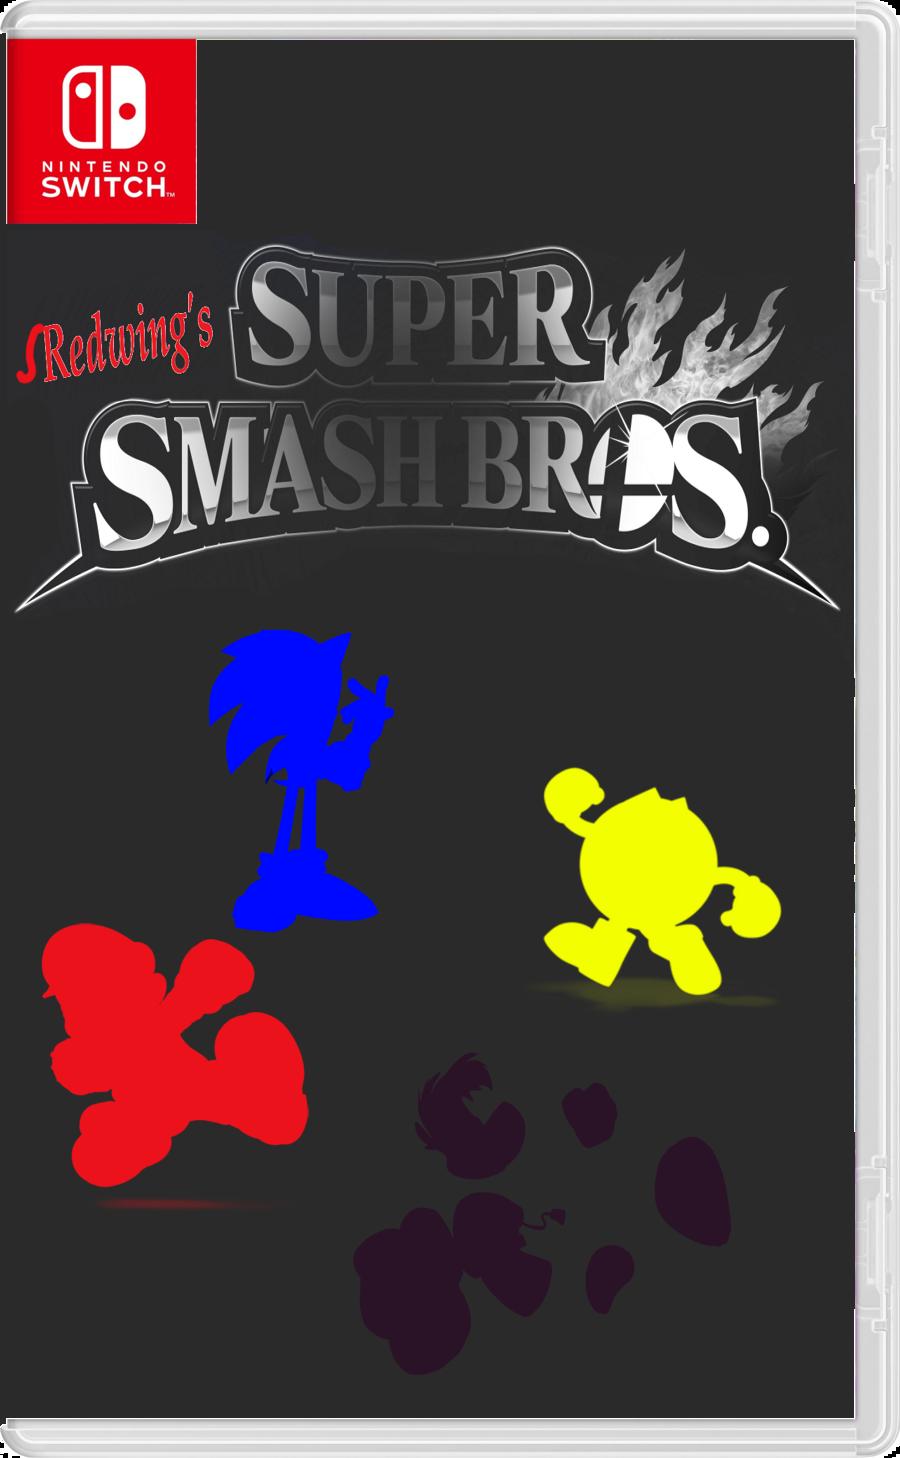 Redwing's Super Smash Bros | Fantendo - Nintendo Fanon Wiki | FANDOM